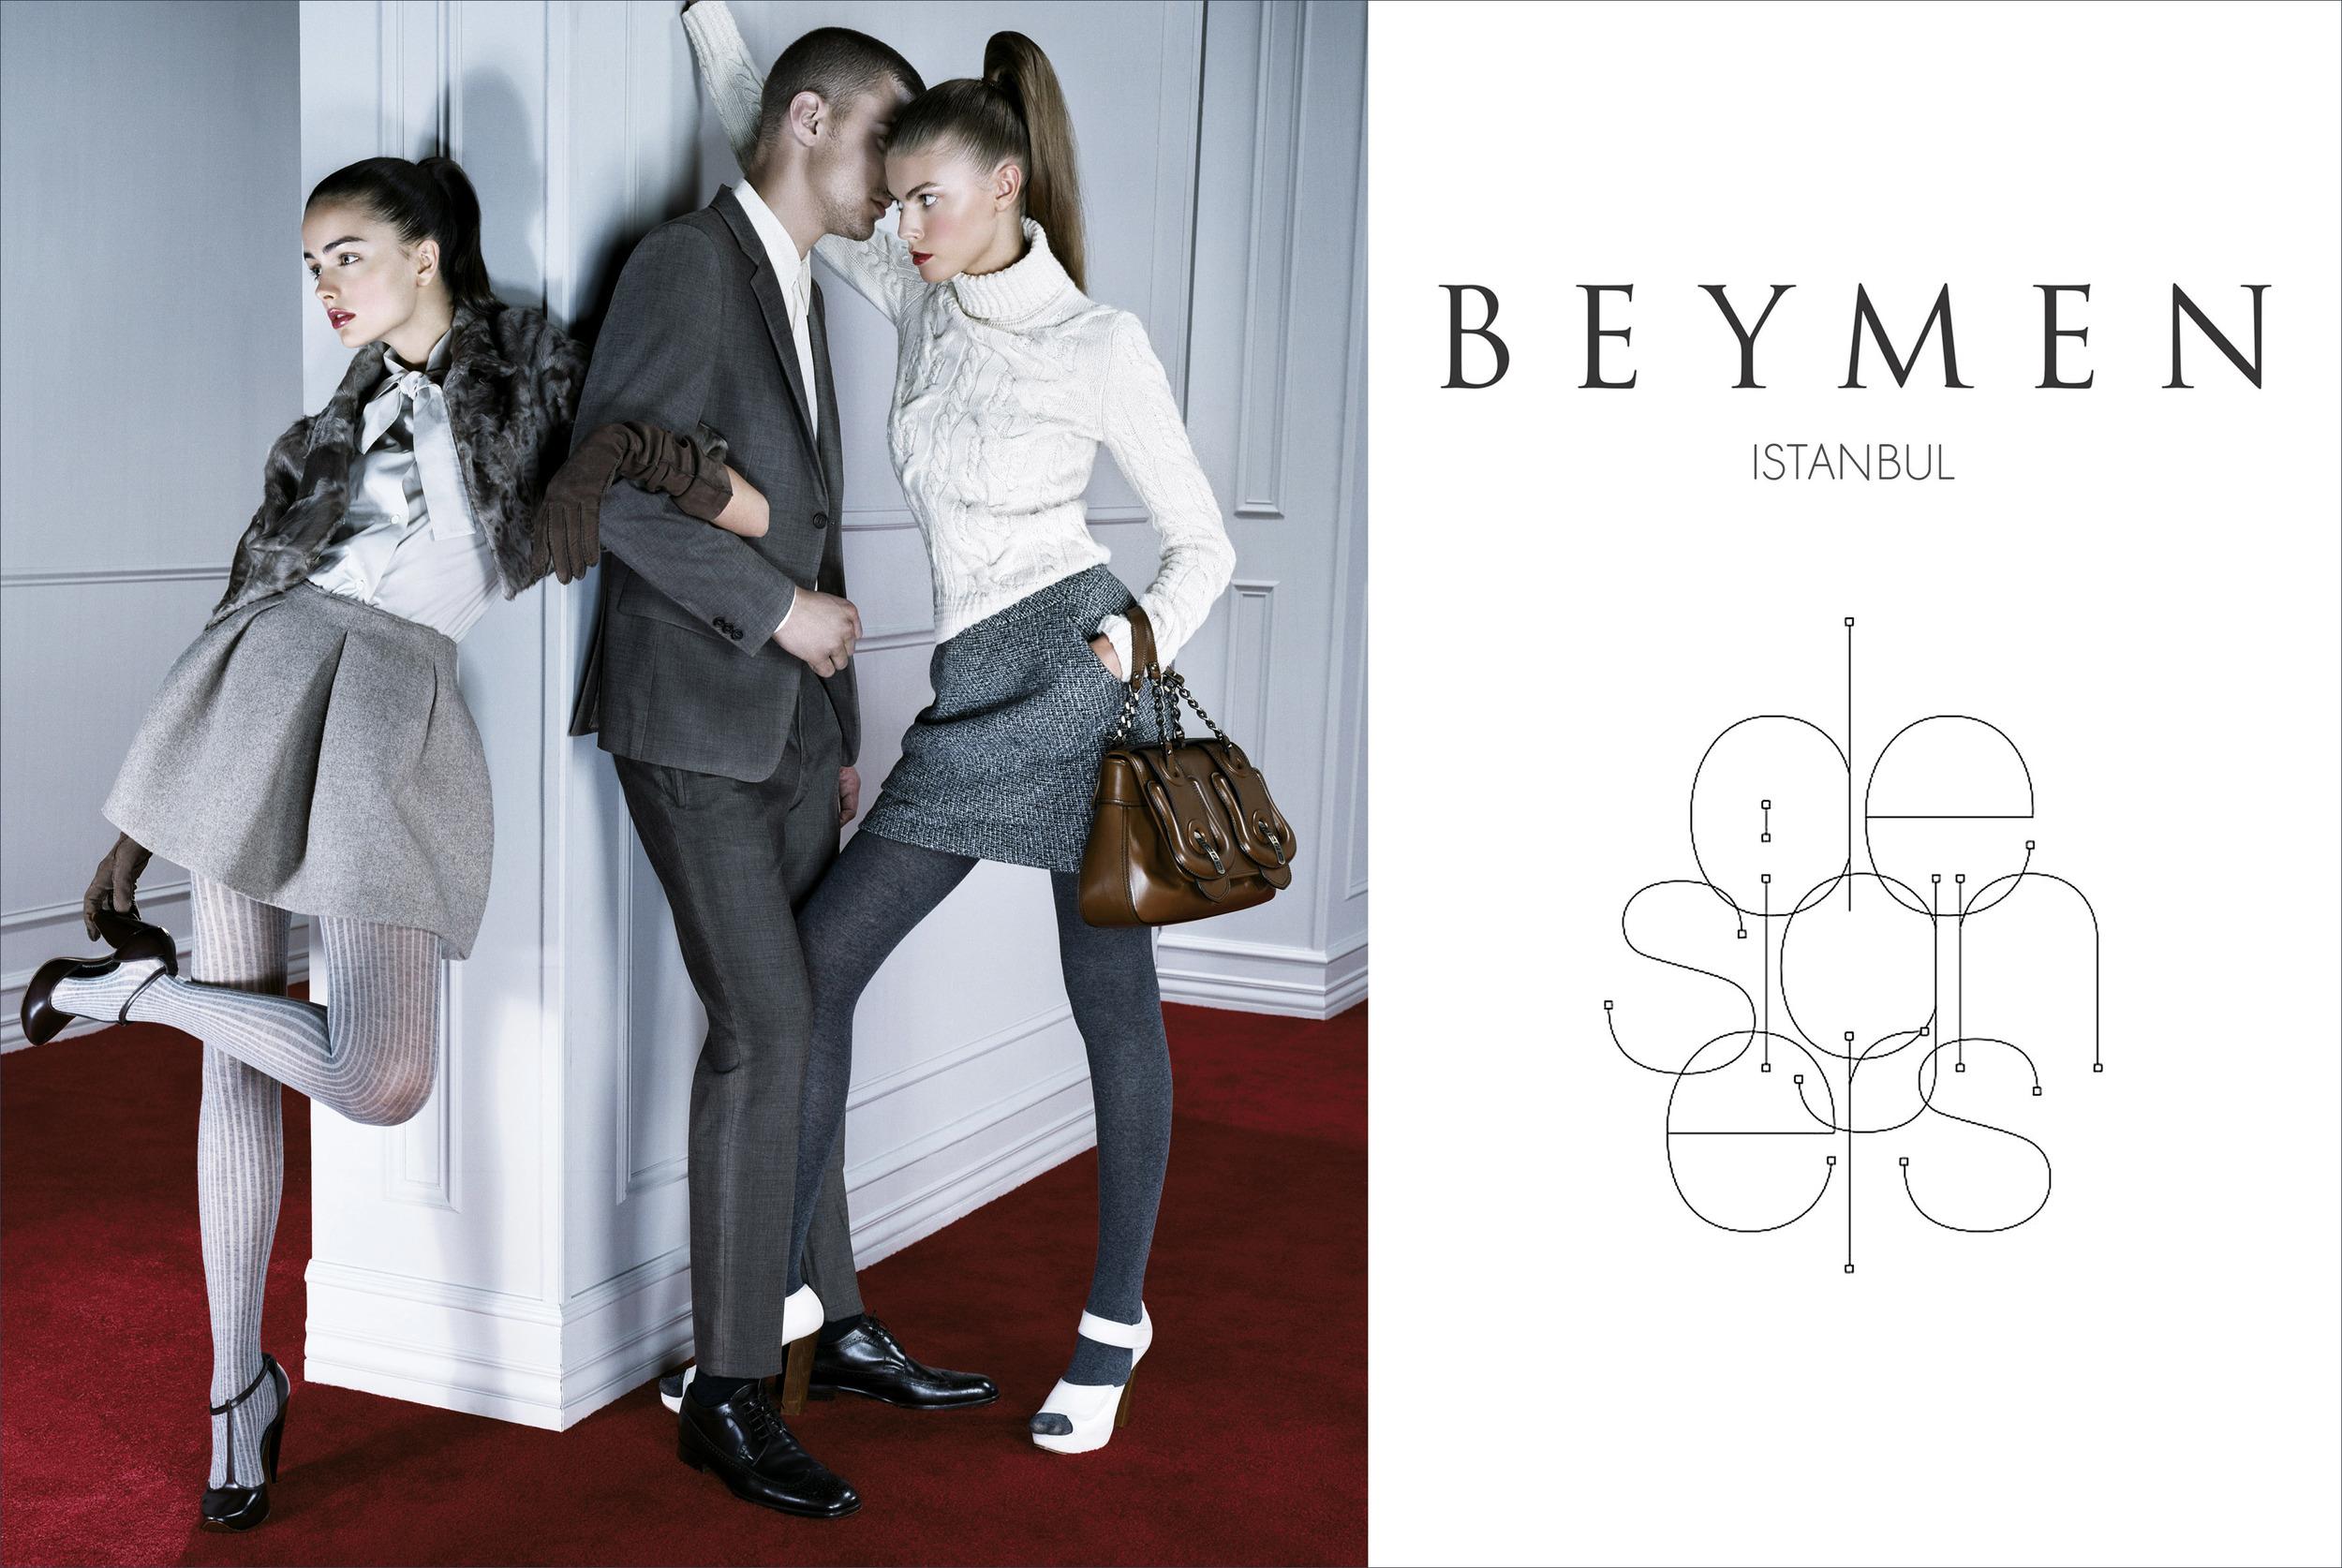 Beyman Istanbul  Designers